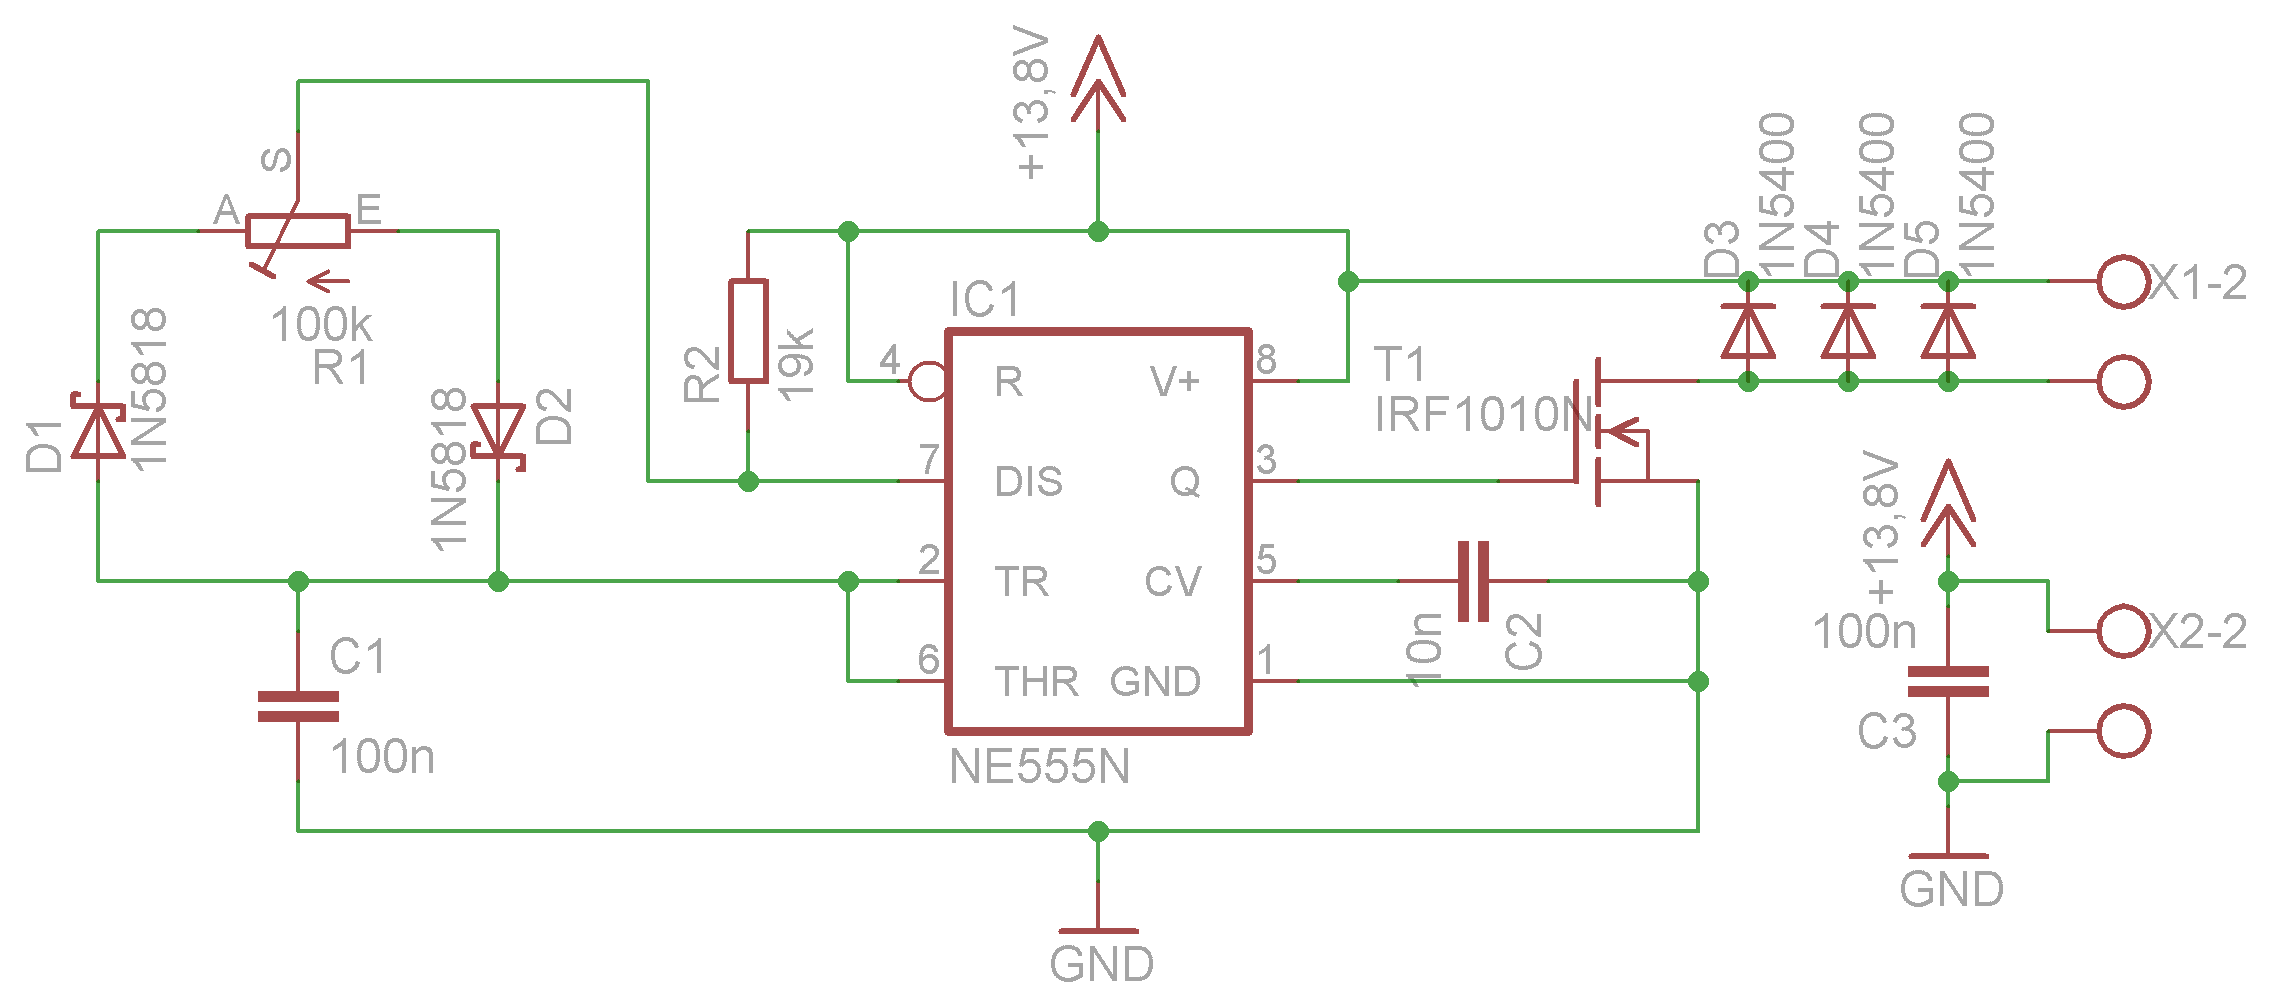 einfacher PWM Motor Drehzahlregler - Mikrocontroller.net